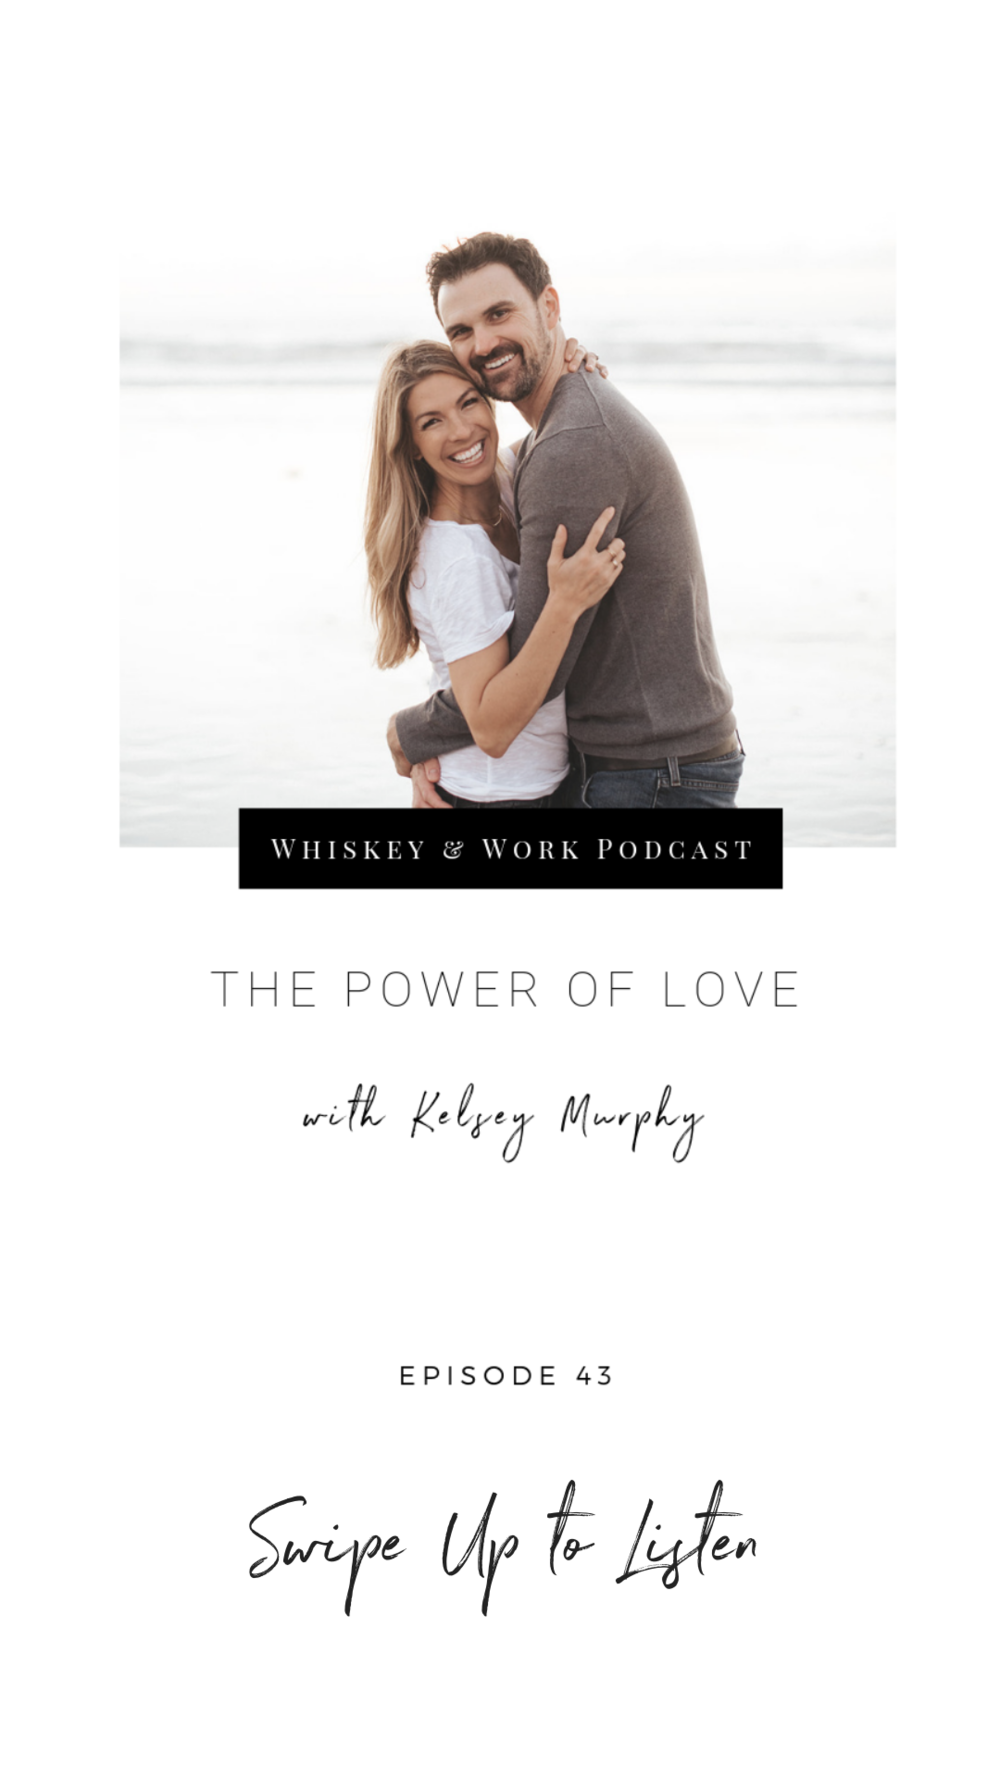 #43_ThePowerOfLove_whiskeyandworkpodcast_kelseymurphy_ig-6.png